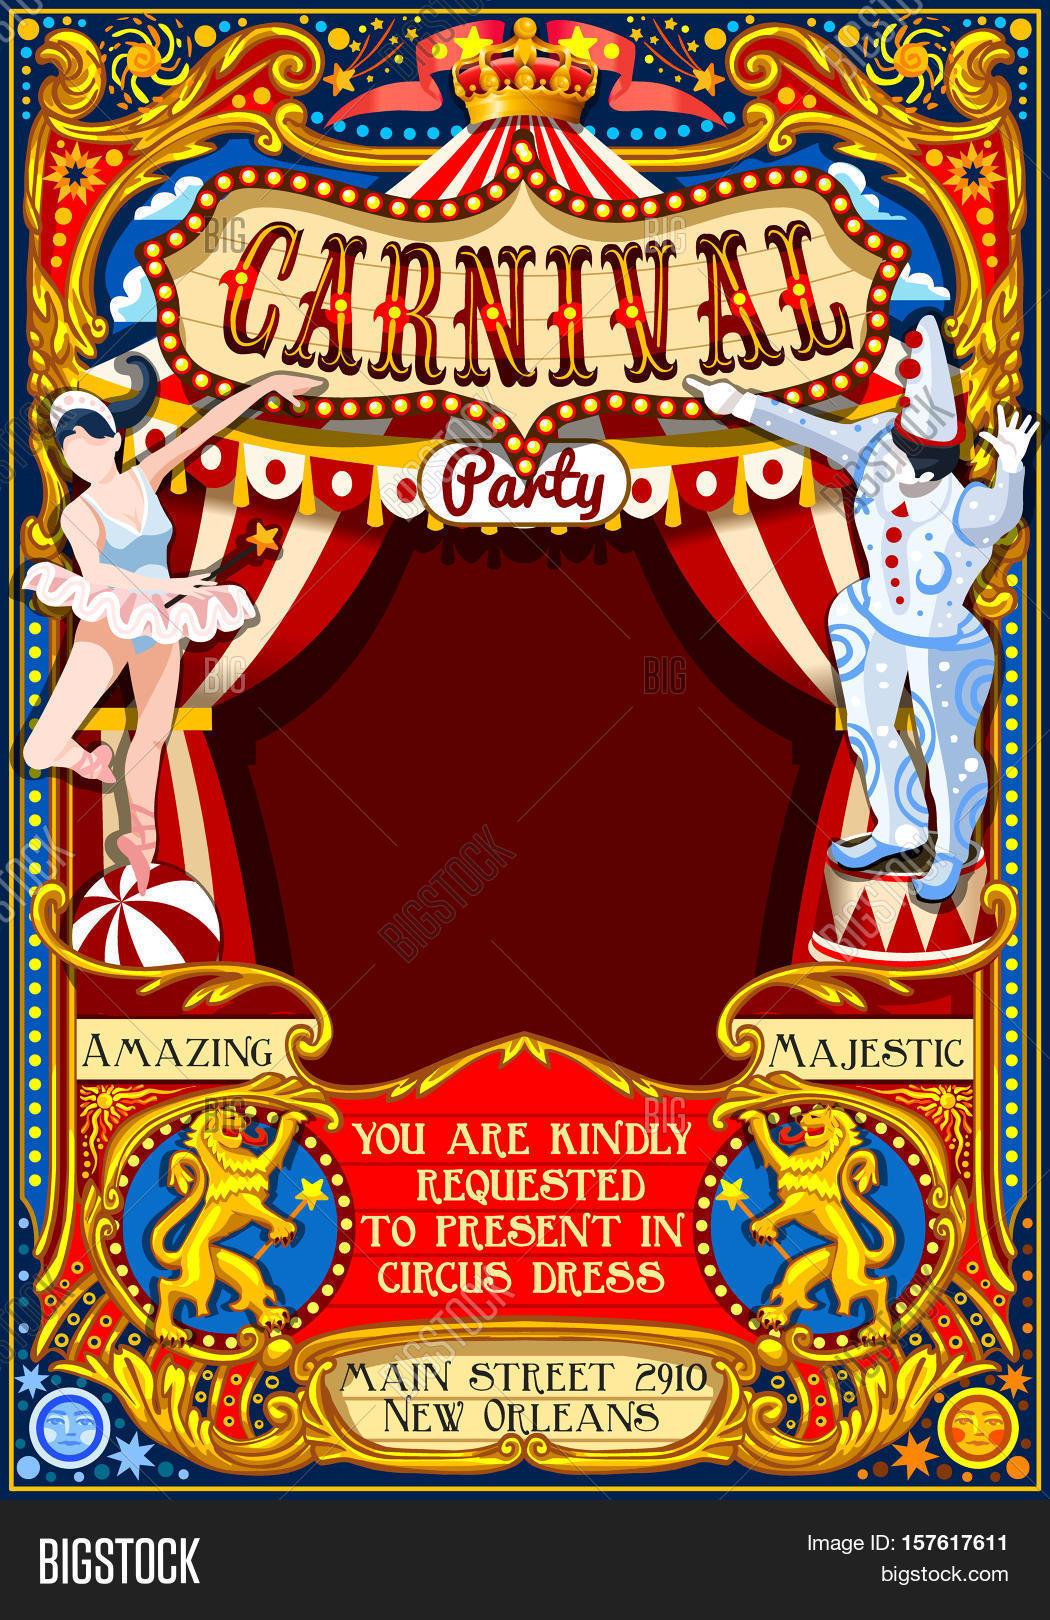 Circus Juggler Show Vector & Photo (Free Trial) | Bigstock